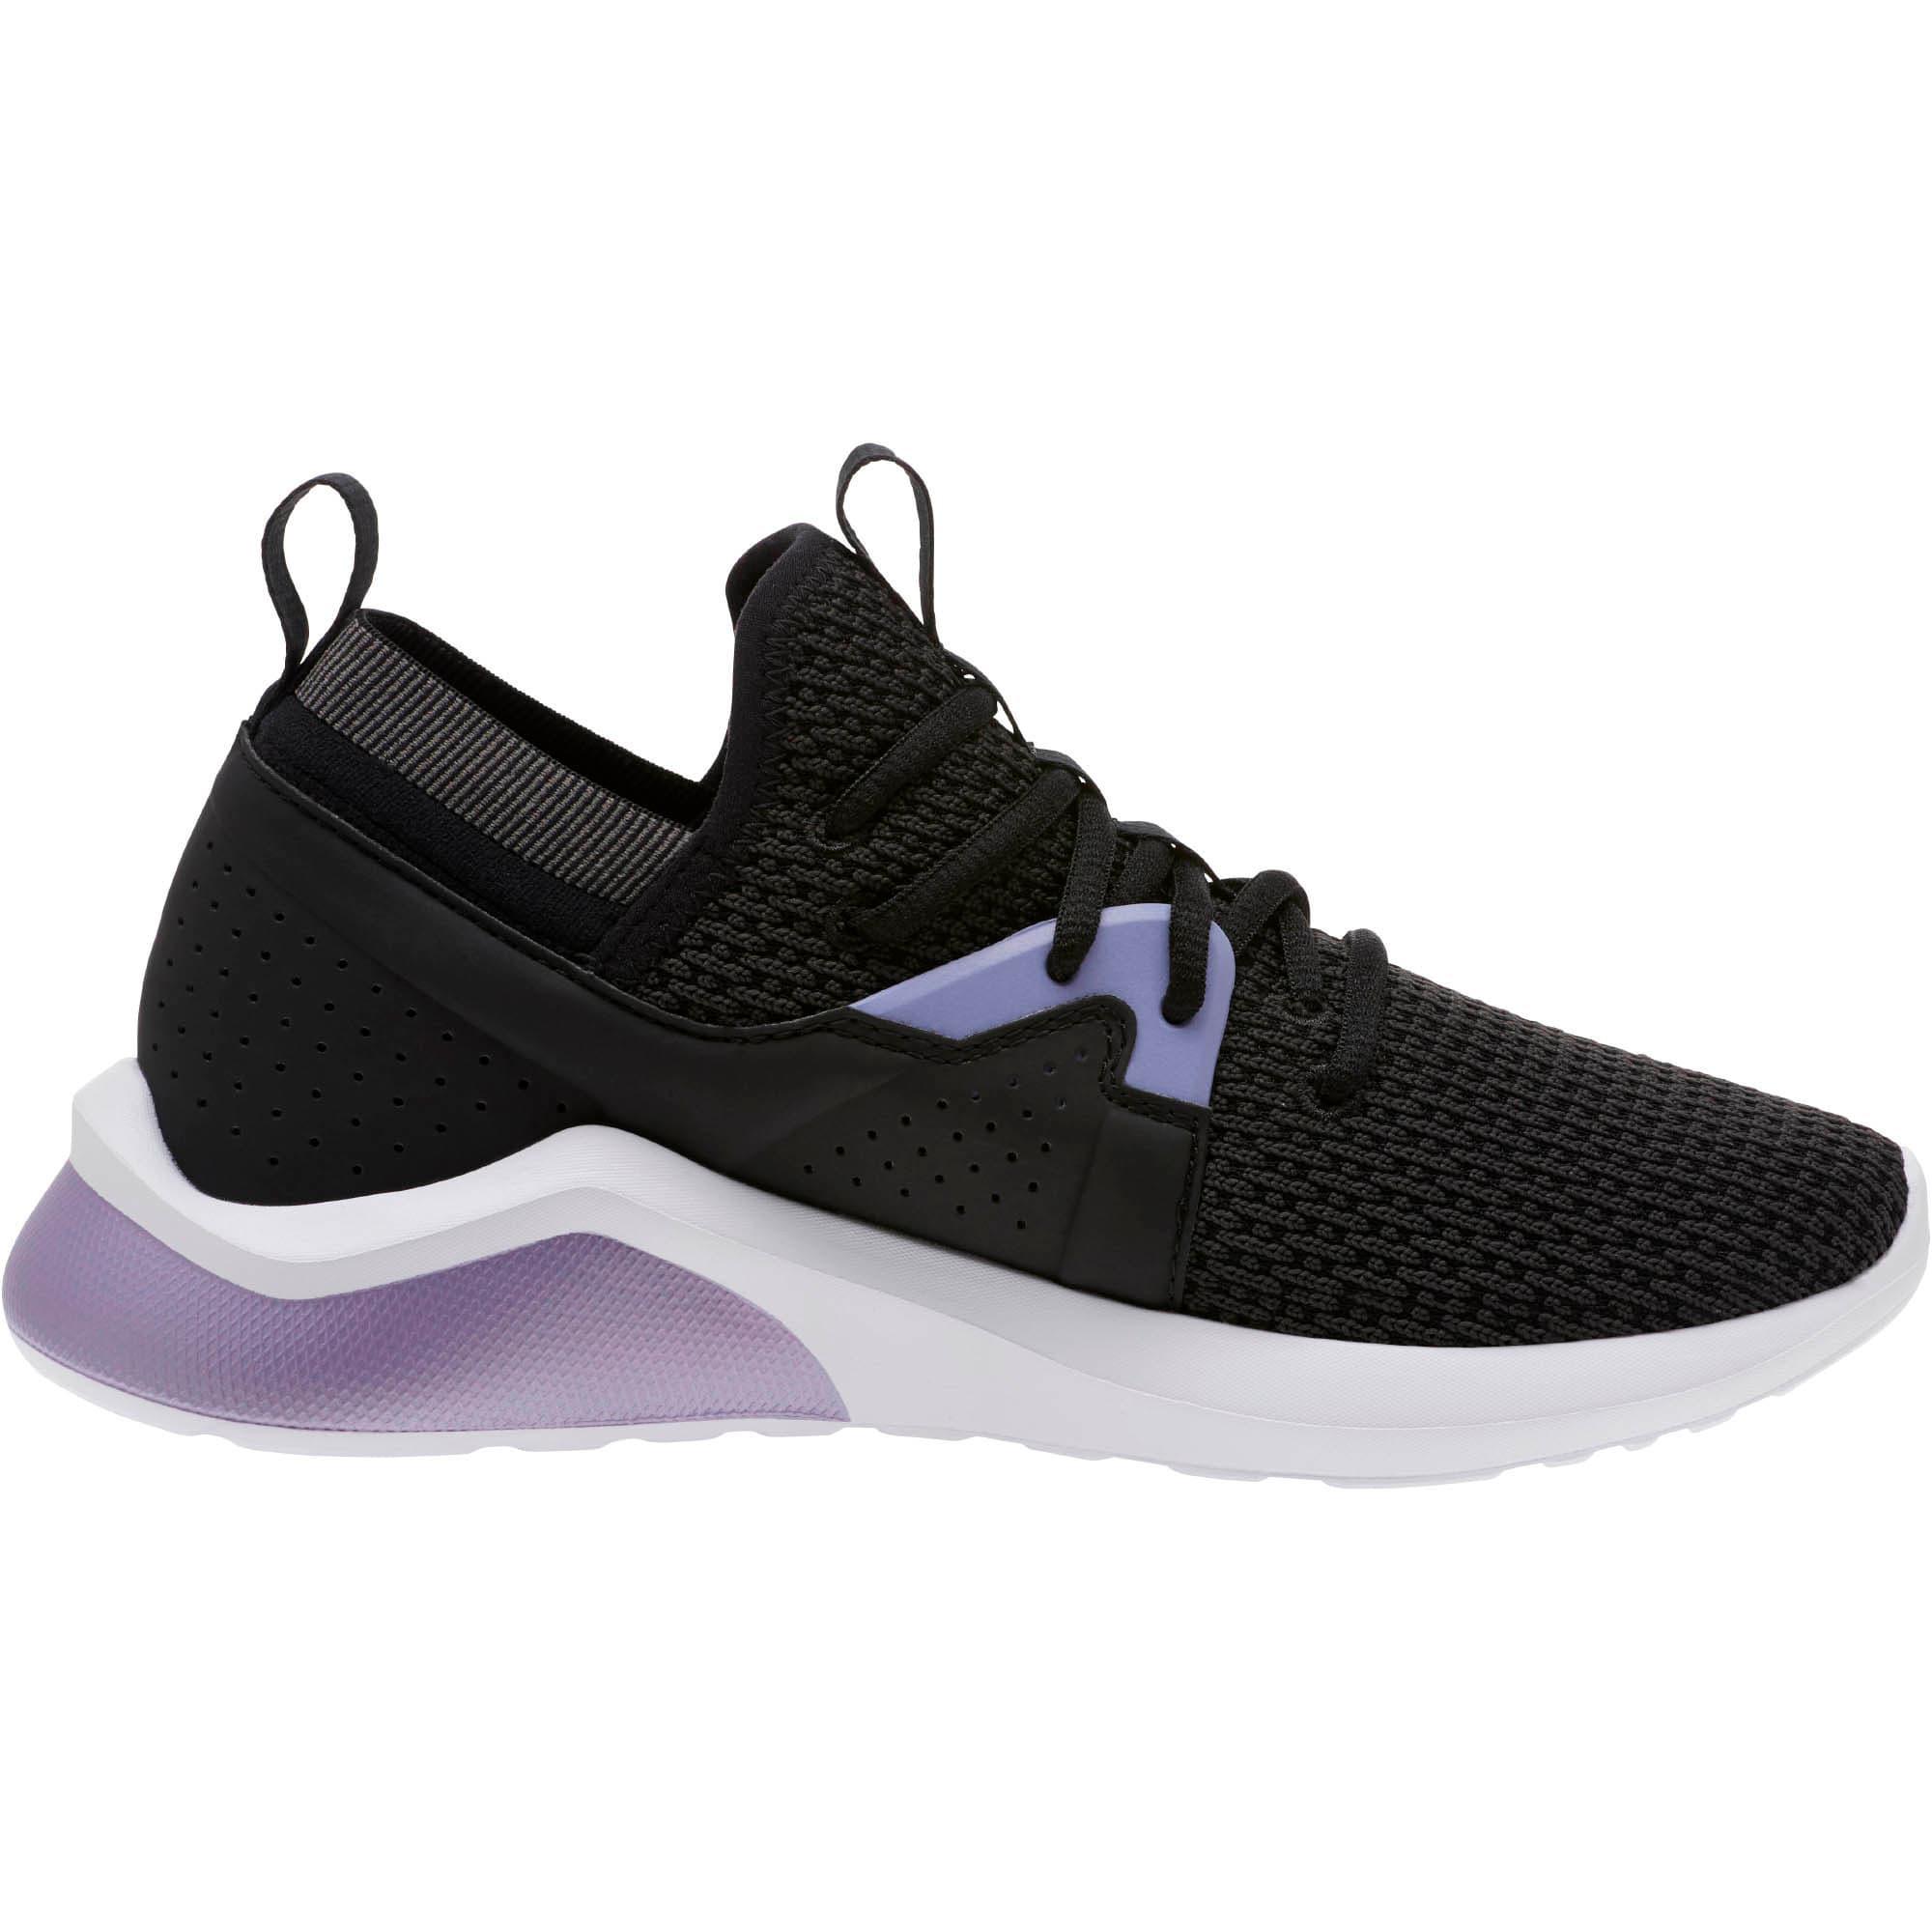 Thumbnail 3 of Emergence Cosmic Women's Sneakers, Puma Black-Sweet Lavender, medium